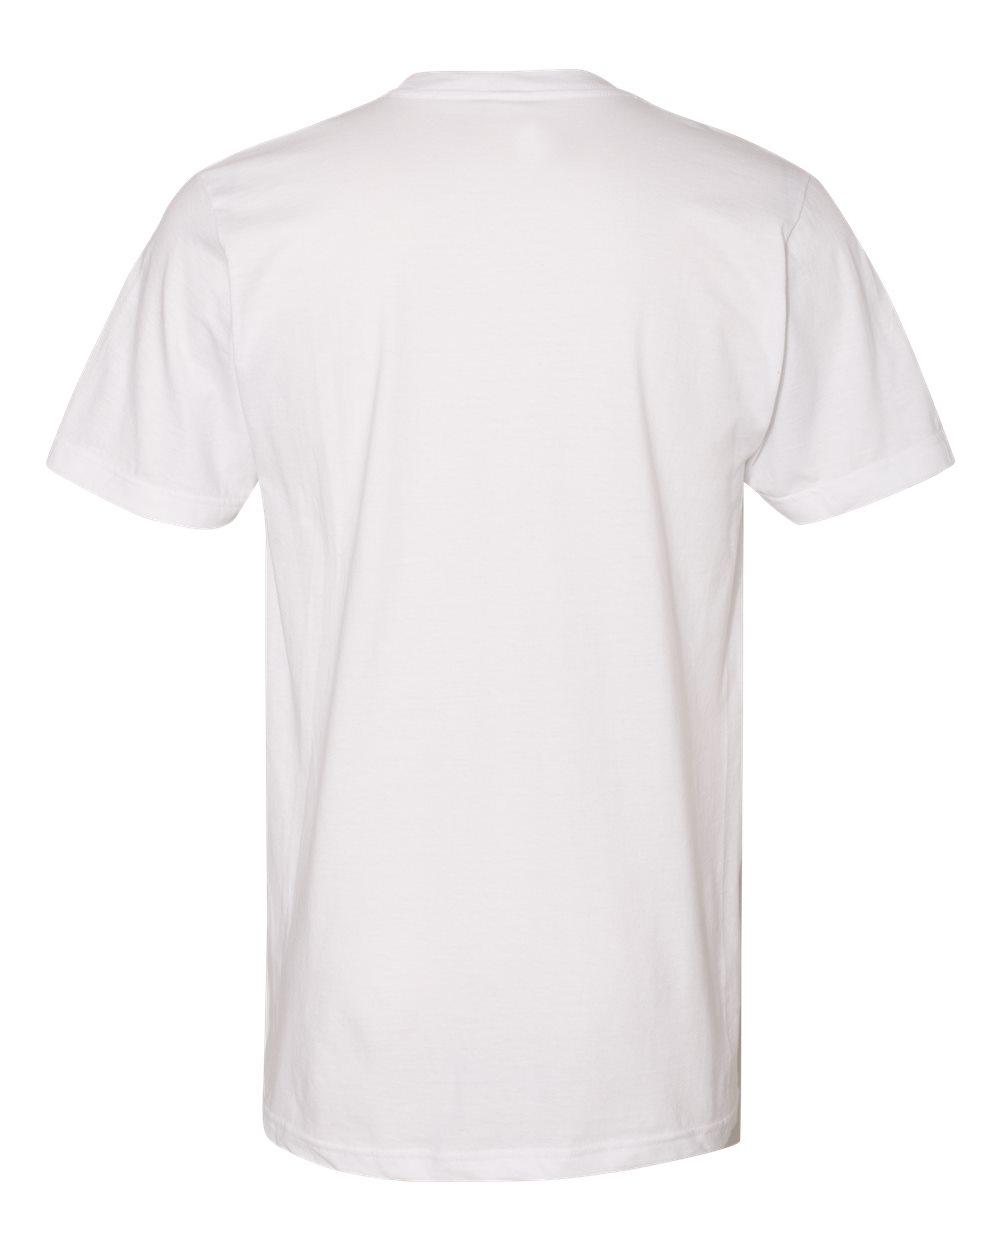 American-Apparel-Mens-Slim-Fit-50-50-Cotton-T-Shirt-Tee-BB401W-up-to-2XL thumbnail 52